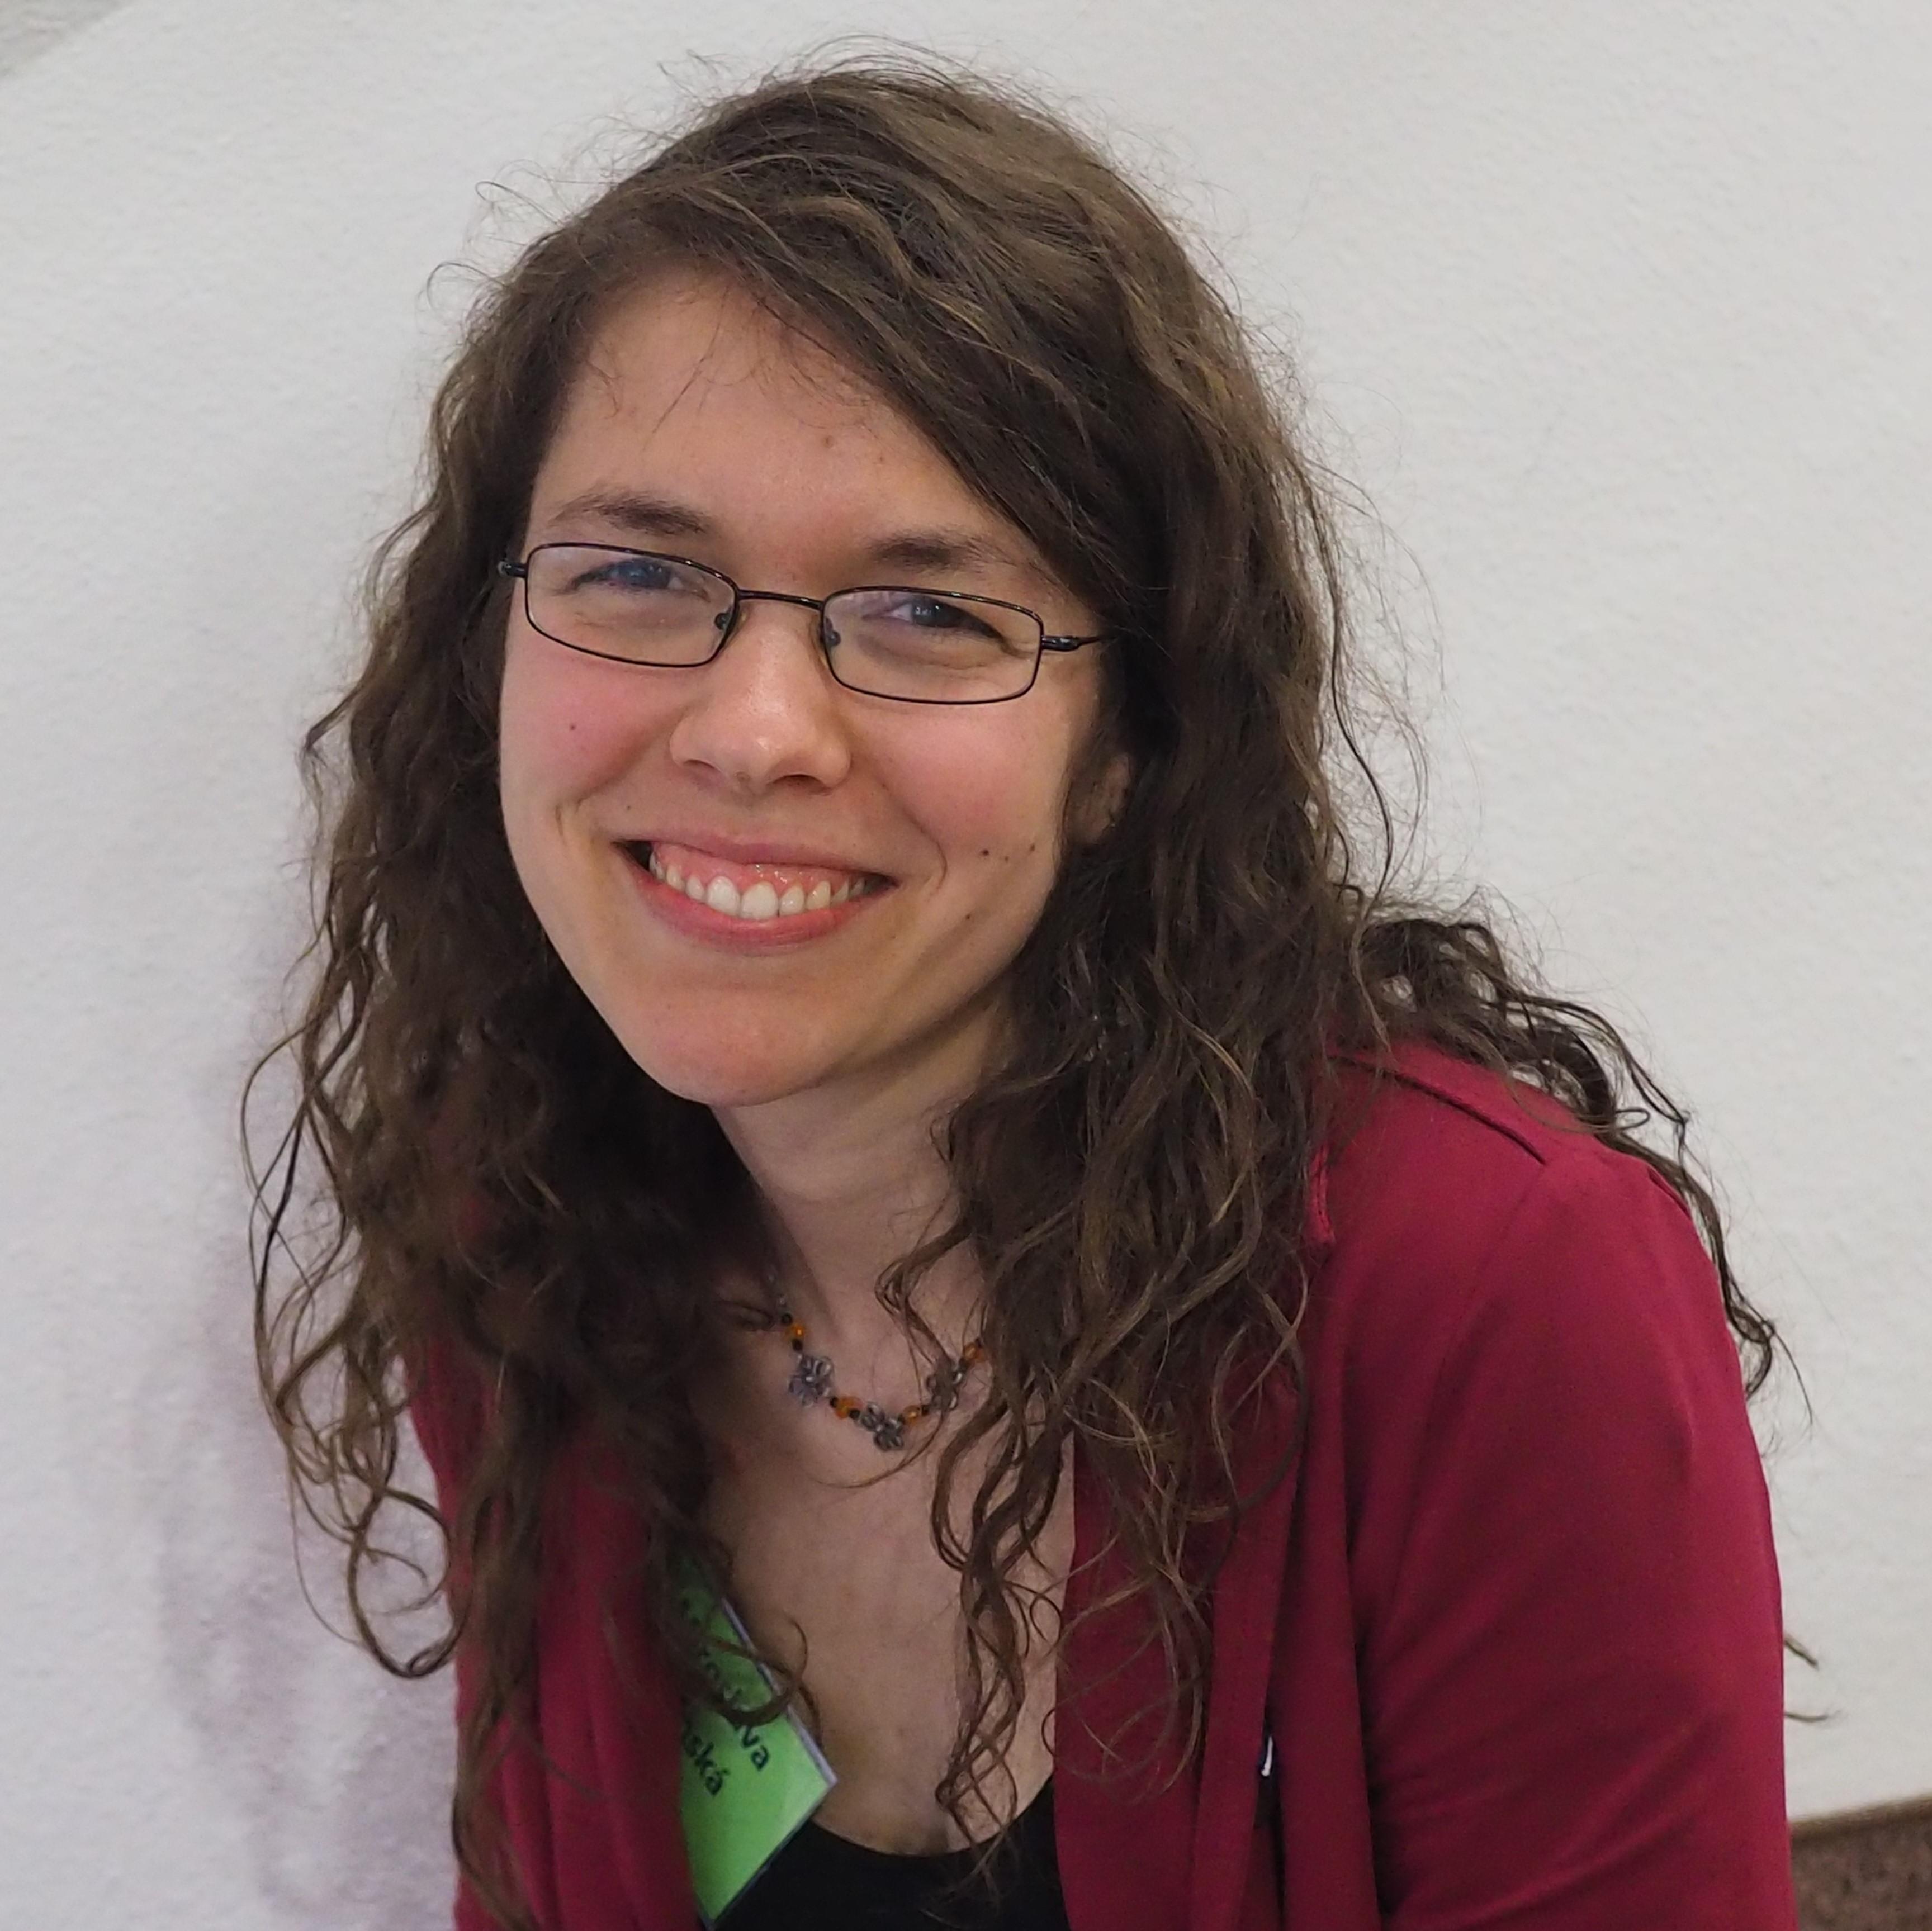 Miroslava Žilinská / Trénerka, konzultantka